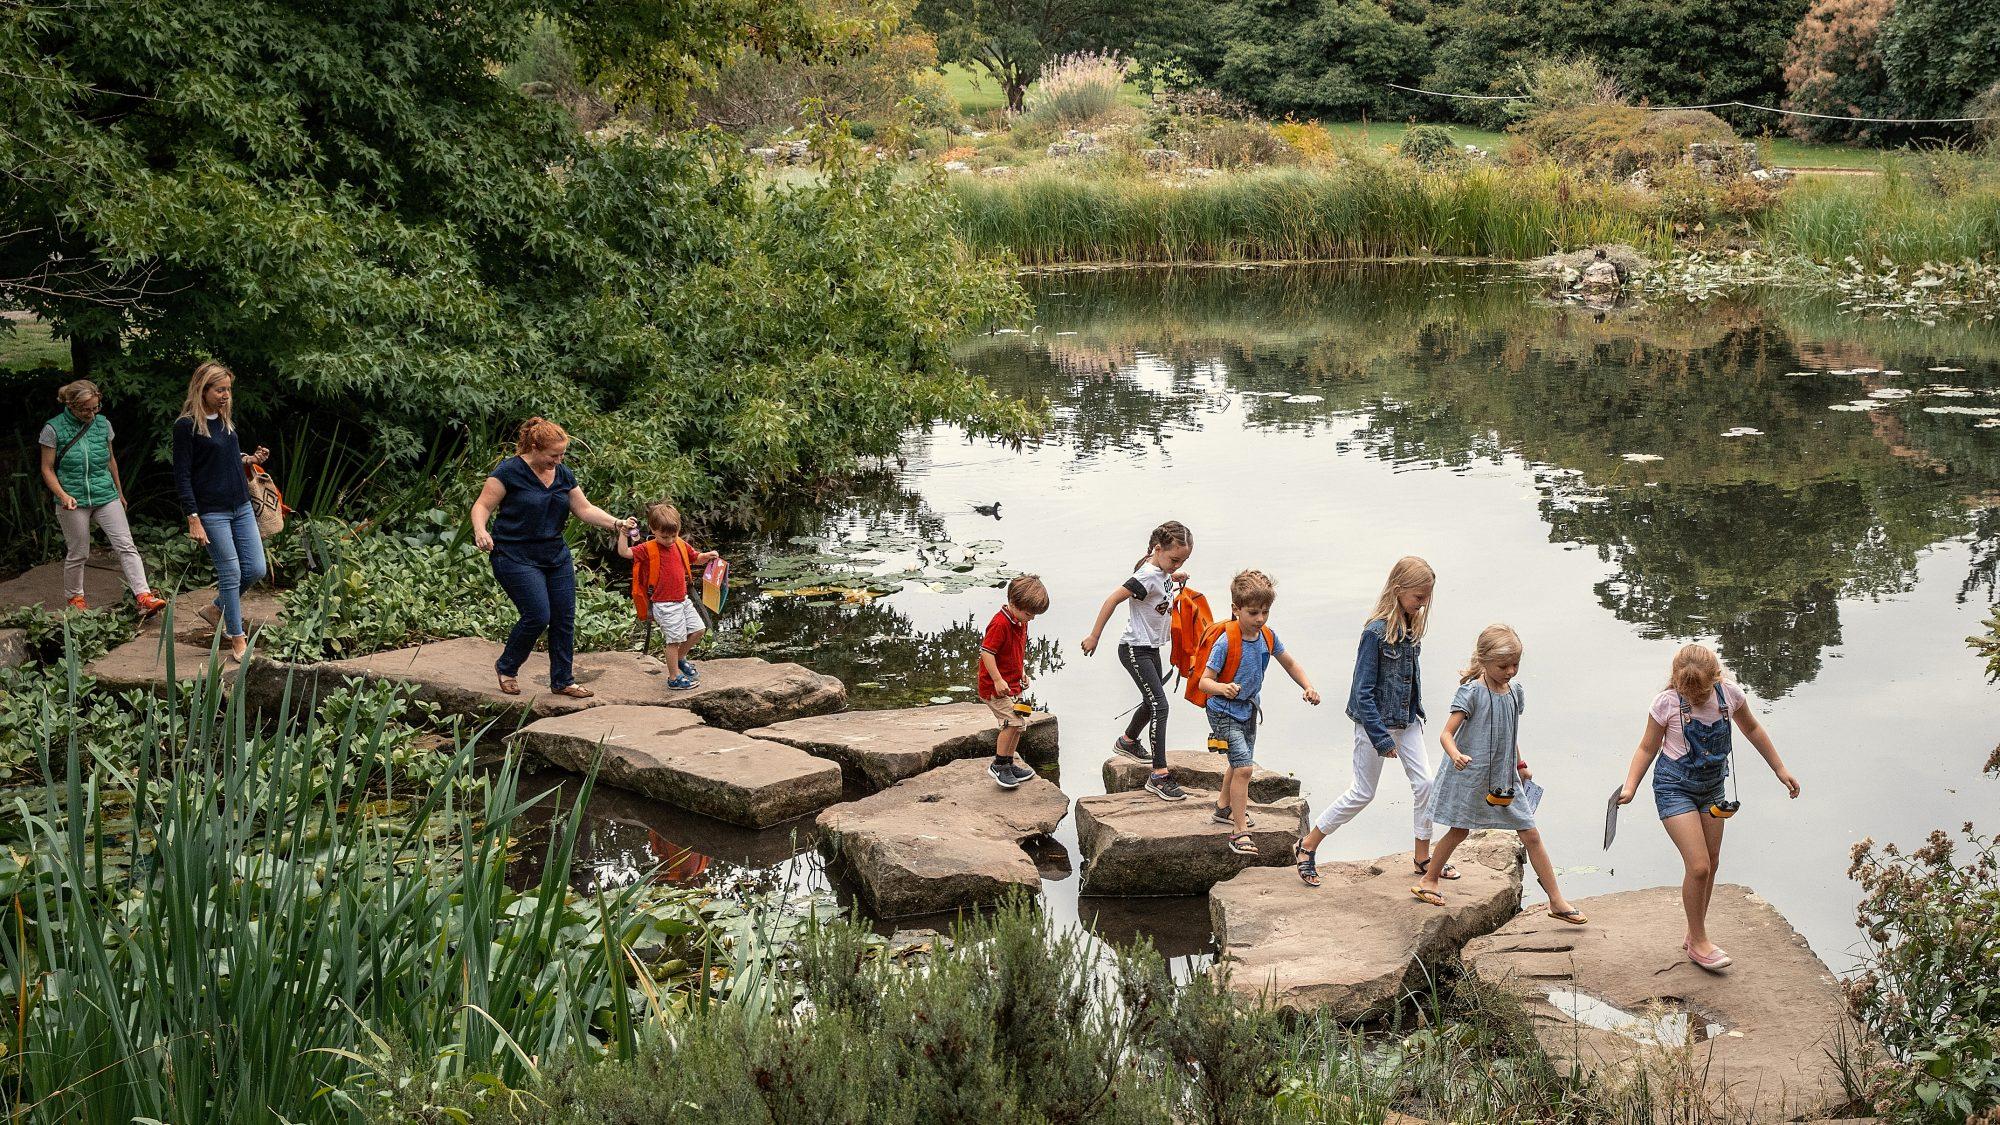 Children crossing the lake.